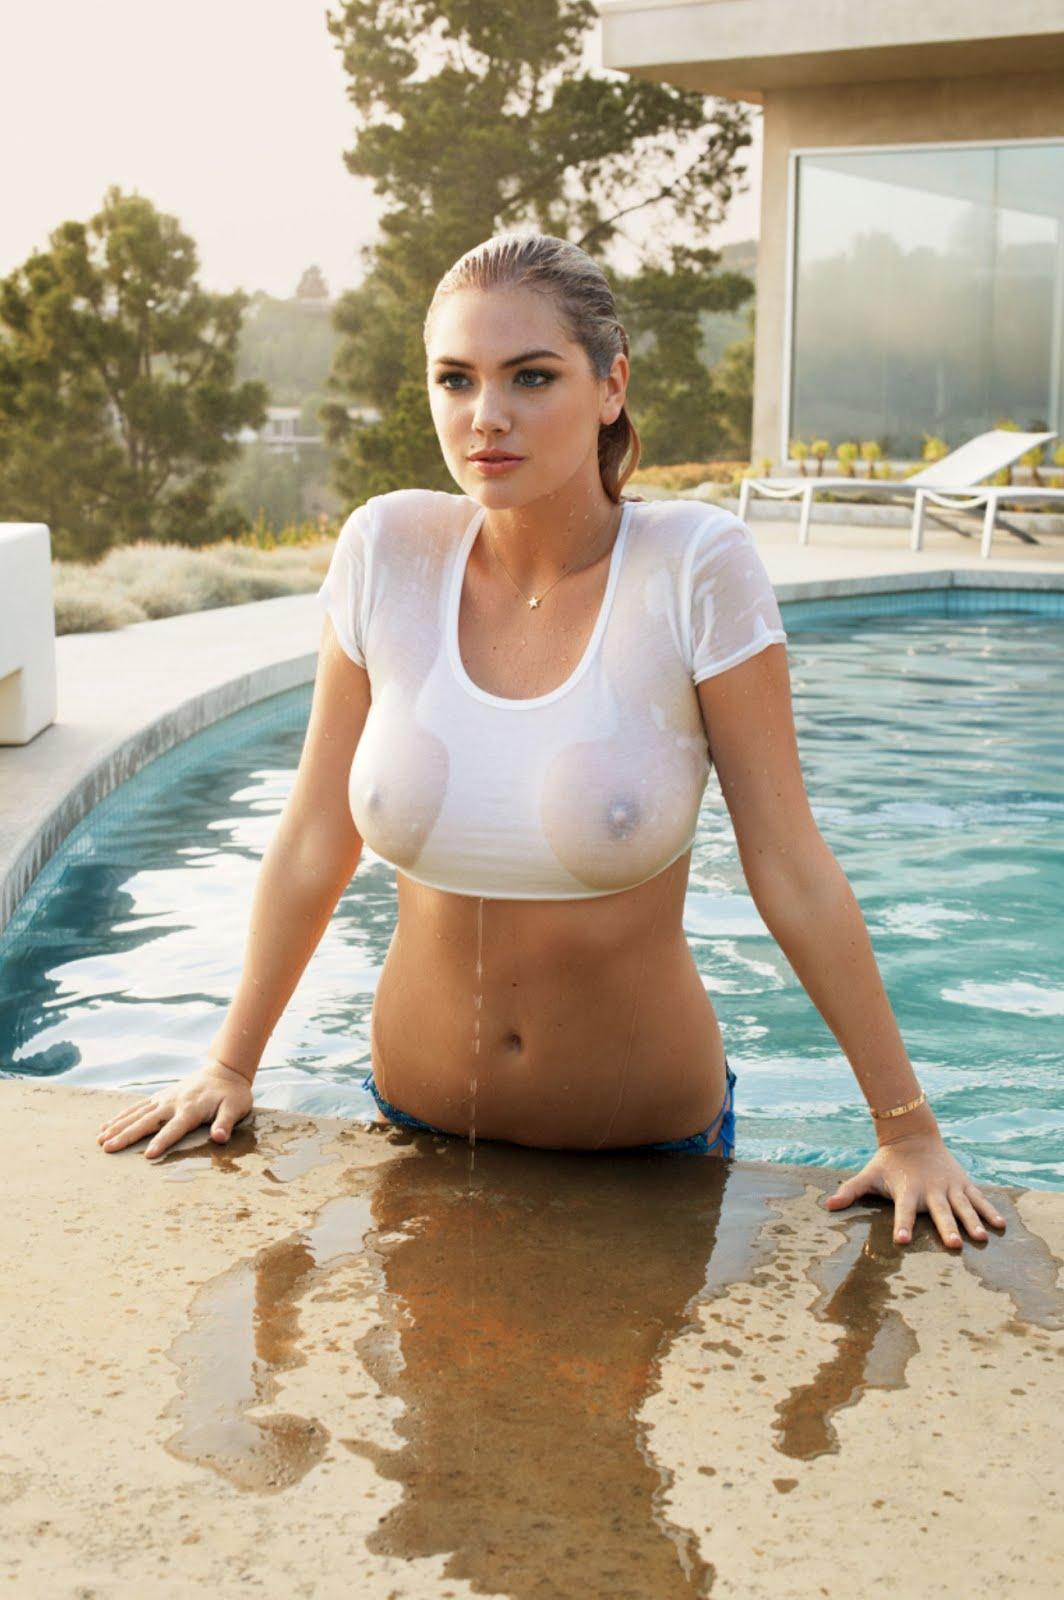 Kate upton wet tshirt video